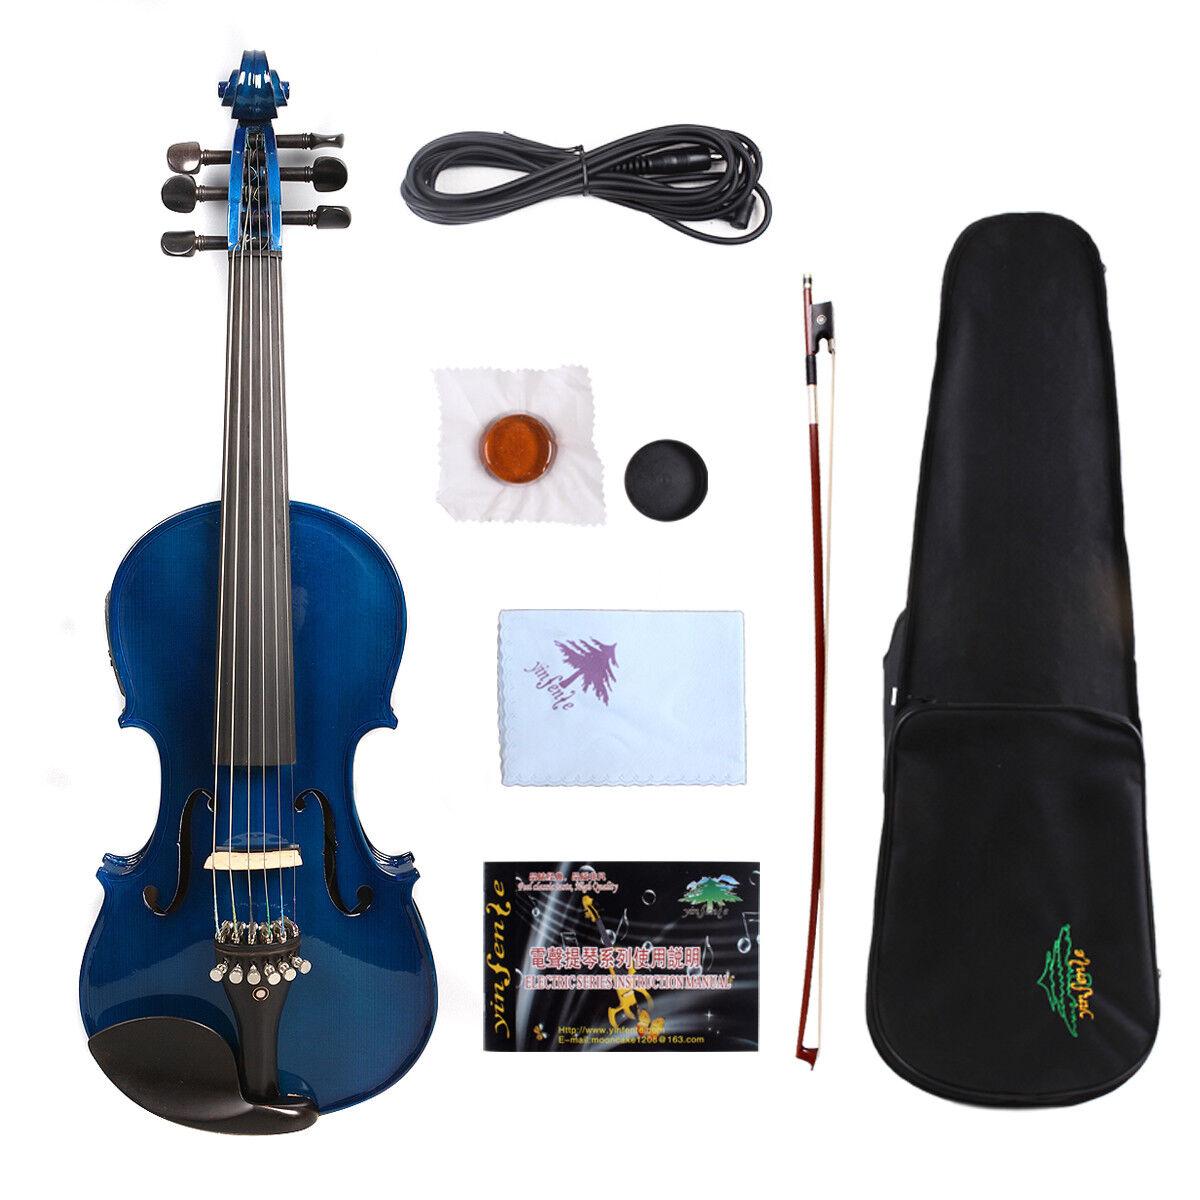 6string Electric Violin 4 4 Maple+spruce handmade High quality violin EV1